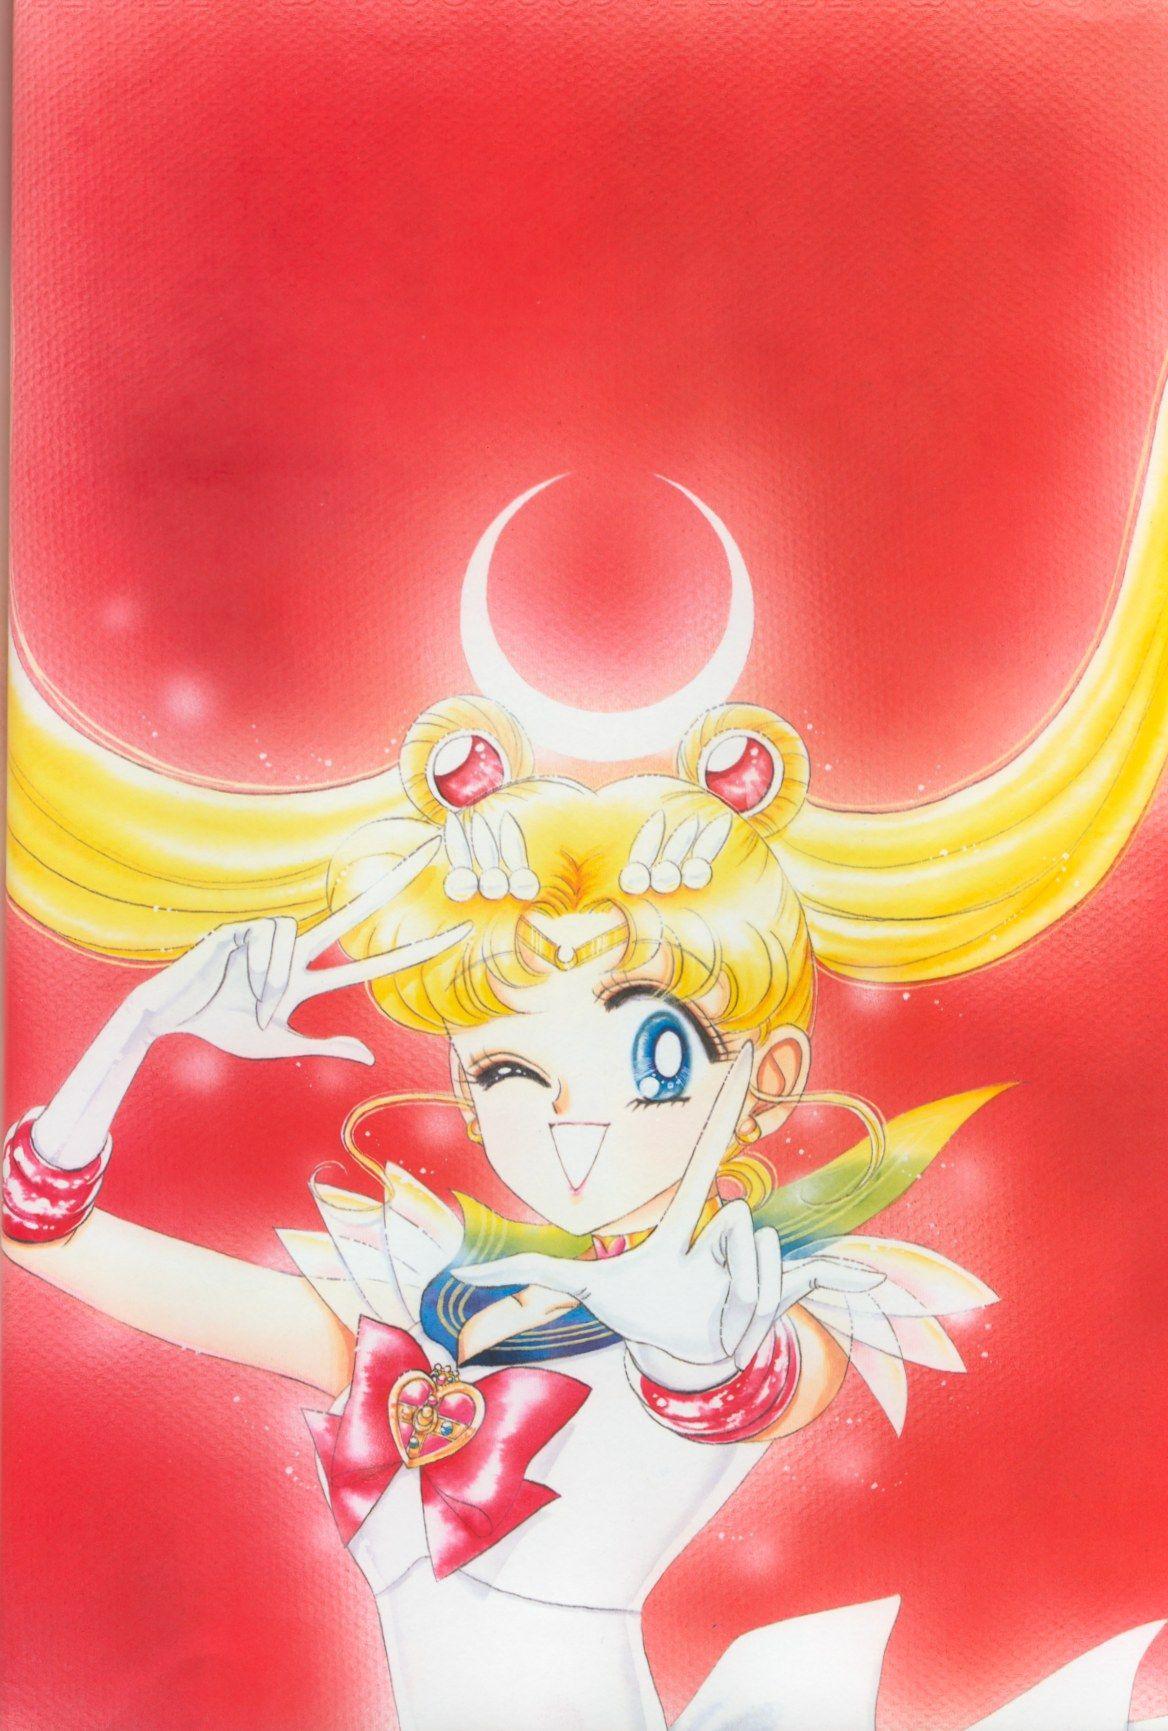 From Volume 3 Of Naoko Takeuchi S Sailor Moon Art Books